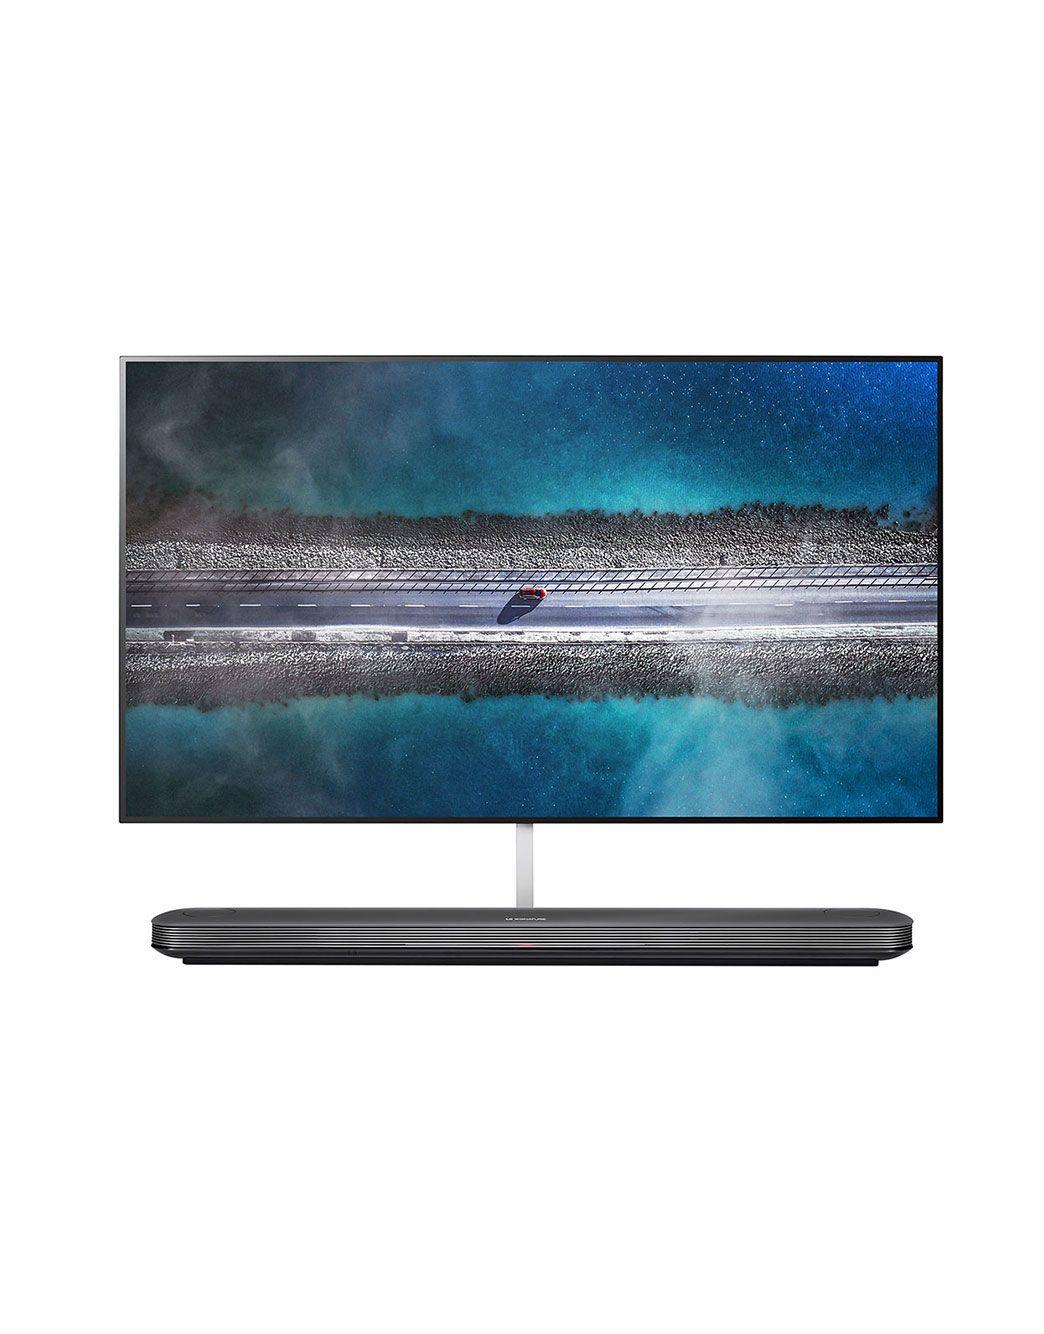 Lg Signature Oled Tv W9 4k Hdr Smart Tv W Ai Thinq 65